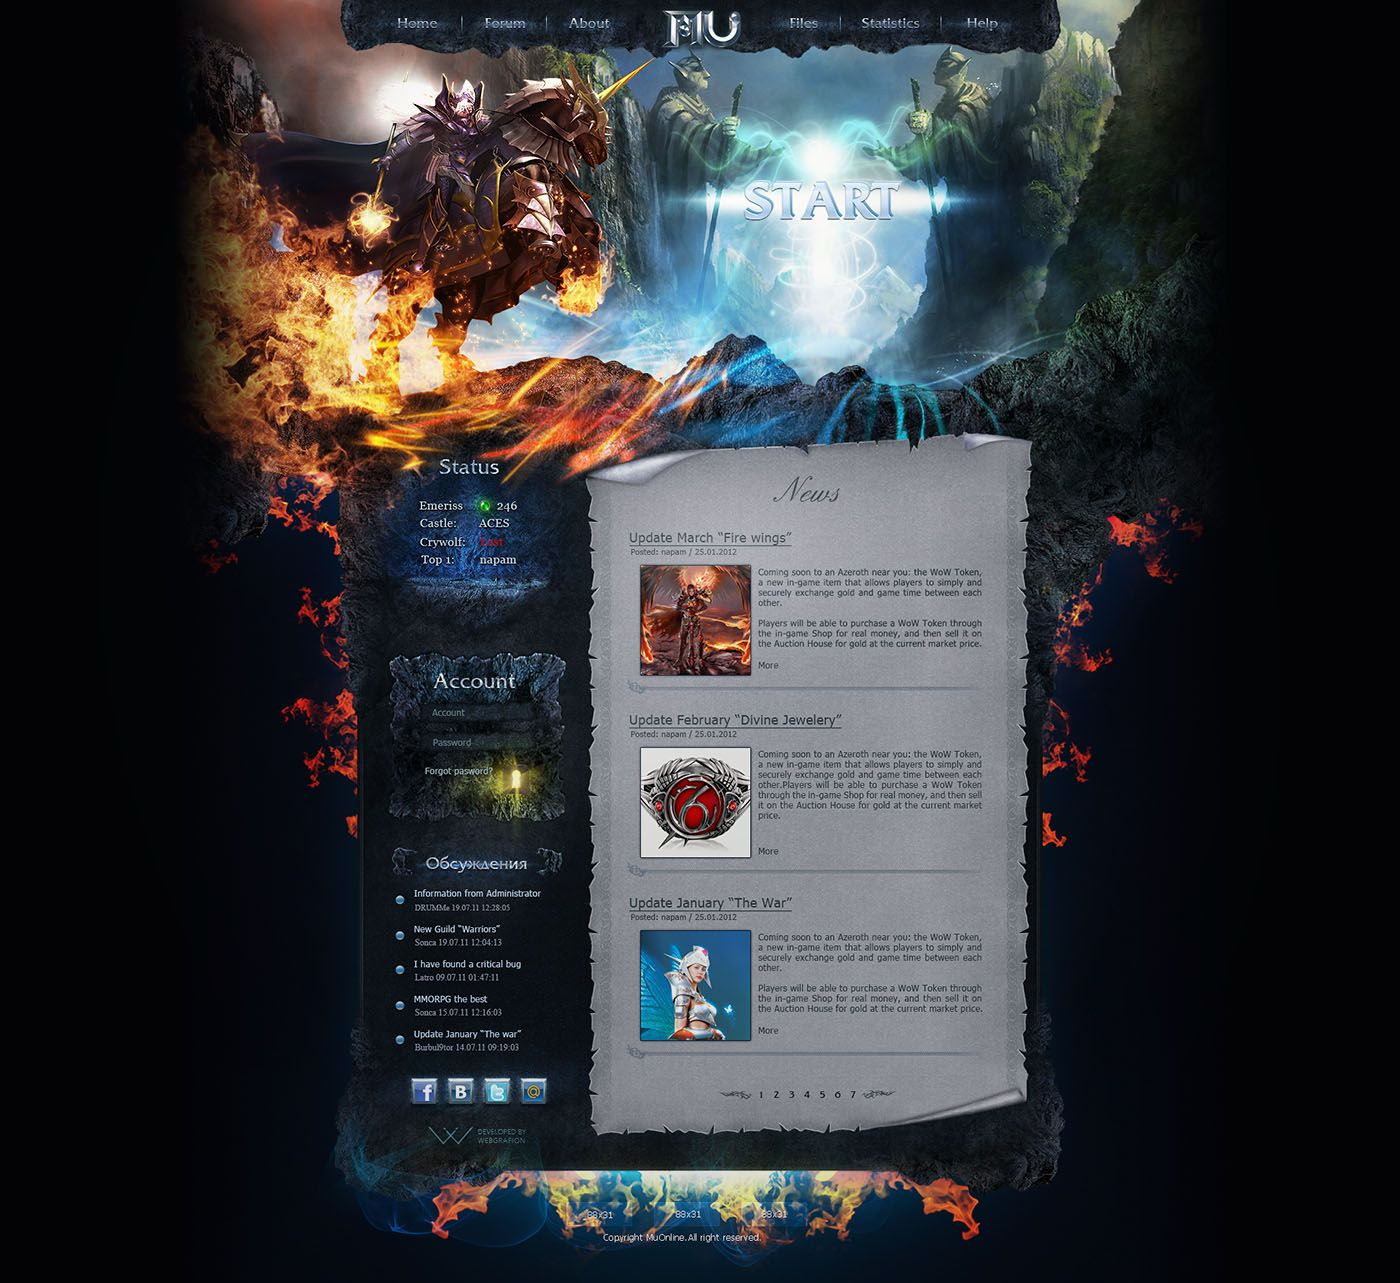 Knight Game Website Template | sait | Pinterest | Knight games ...